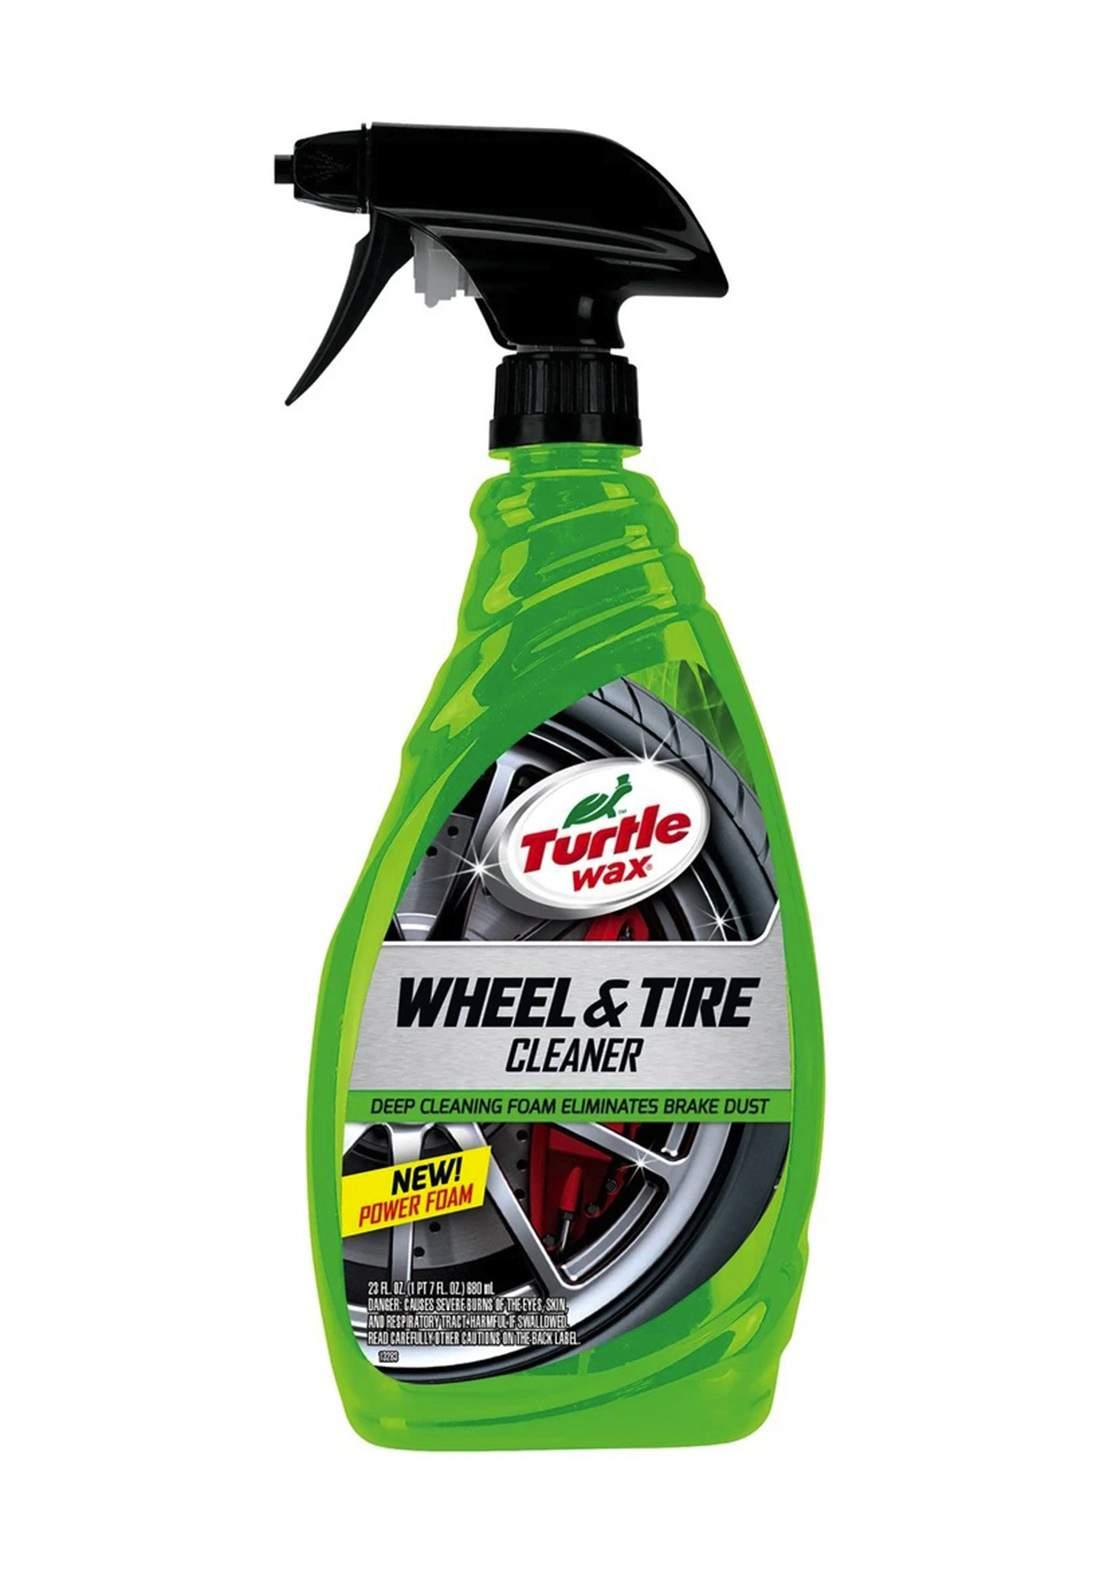 Turtle Wax Wheel And Tire Cleaner 500 g منظف الإطارات والعجلات